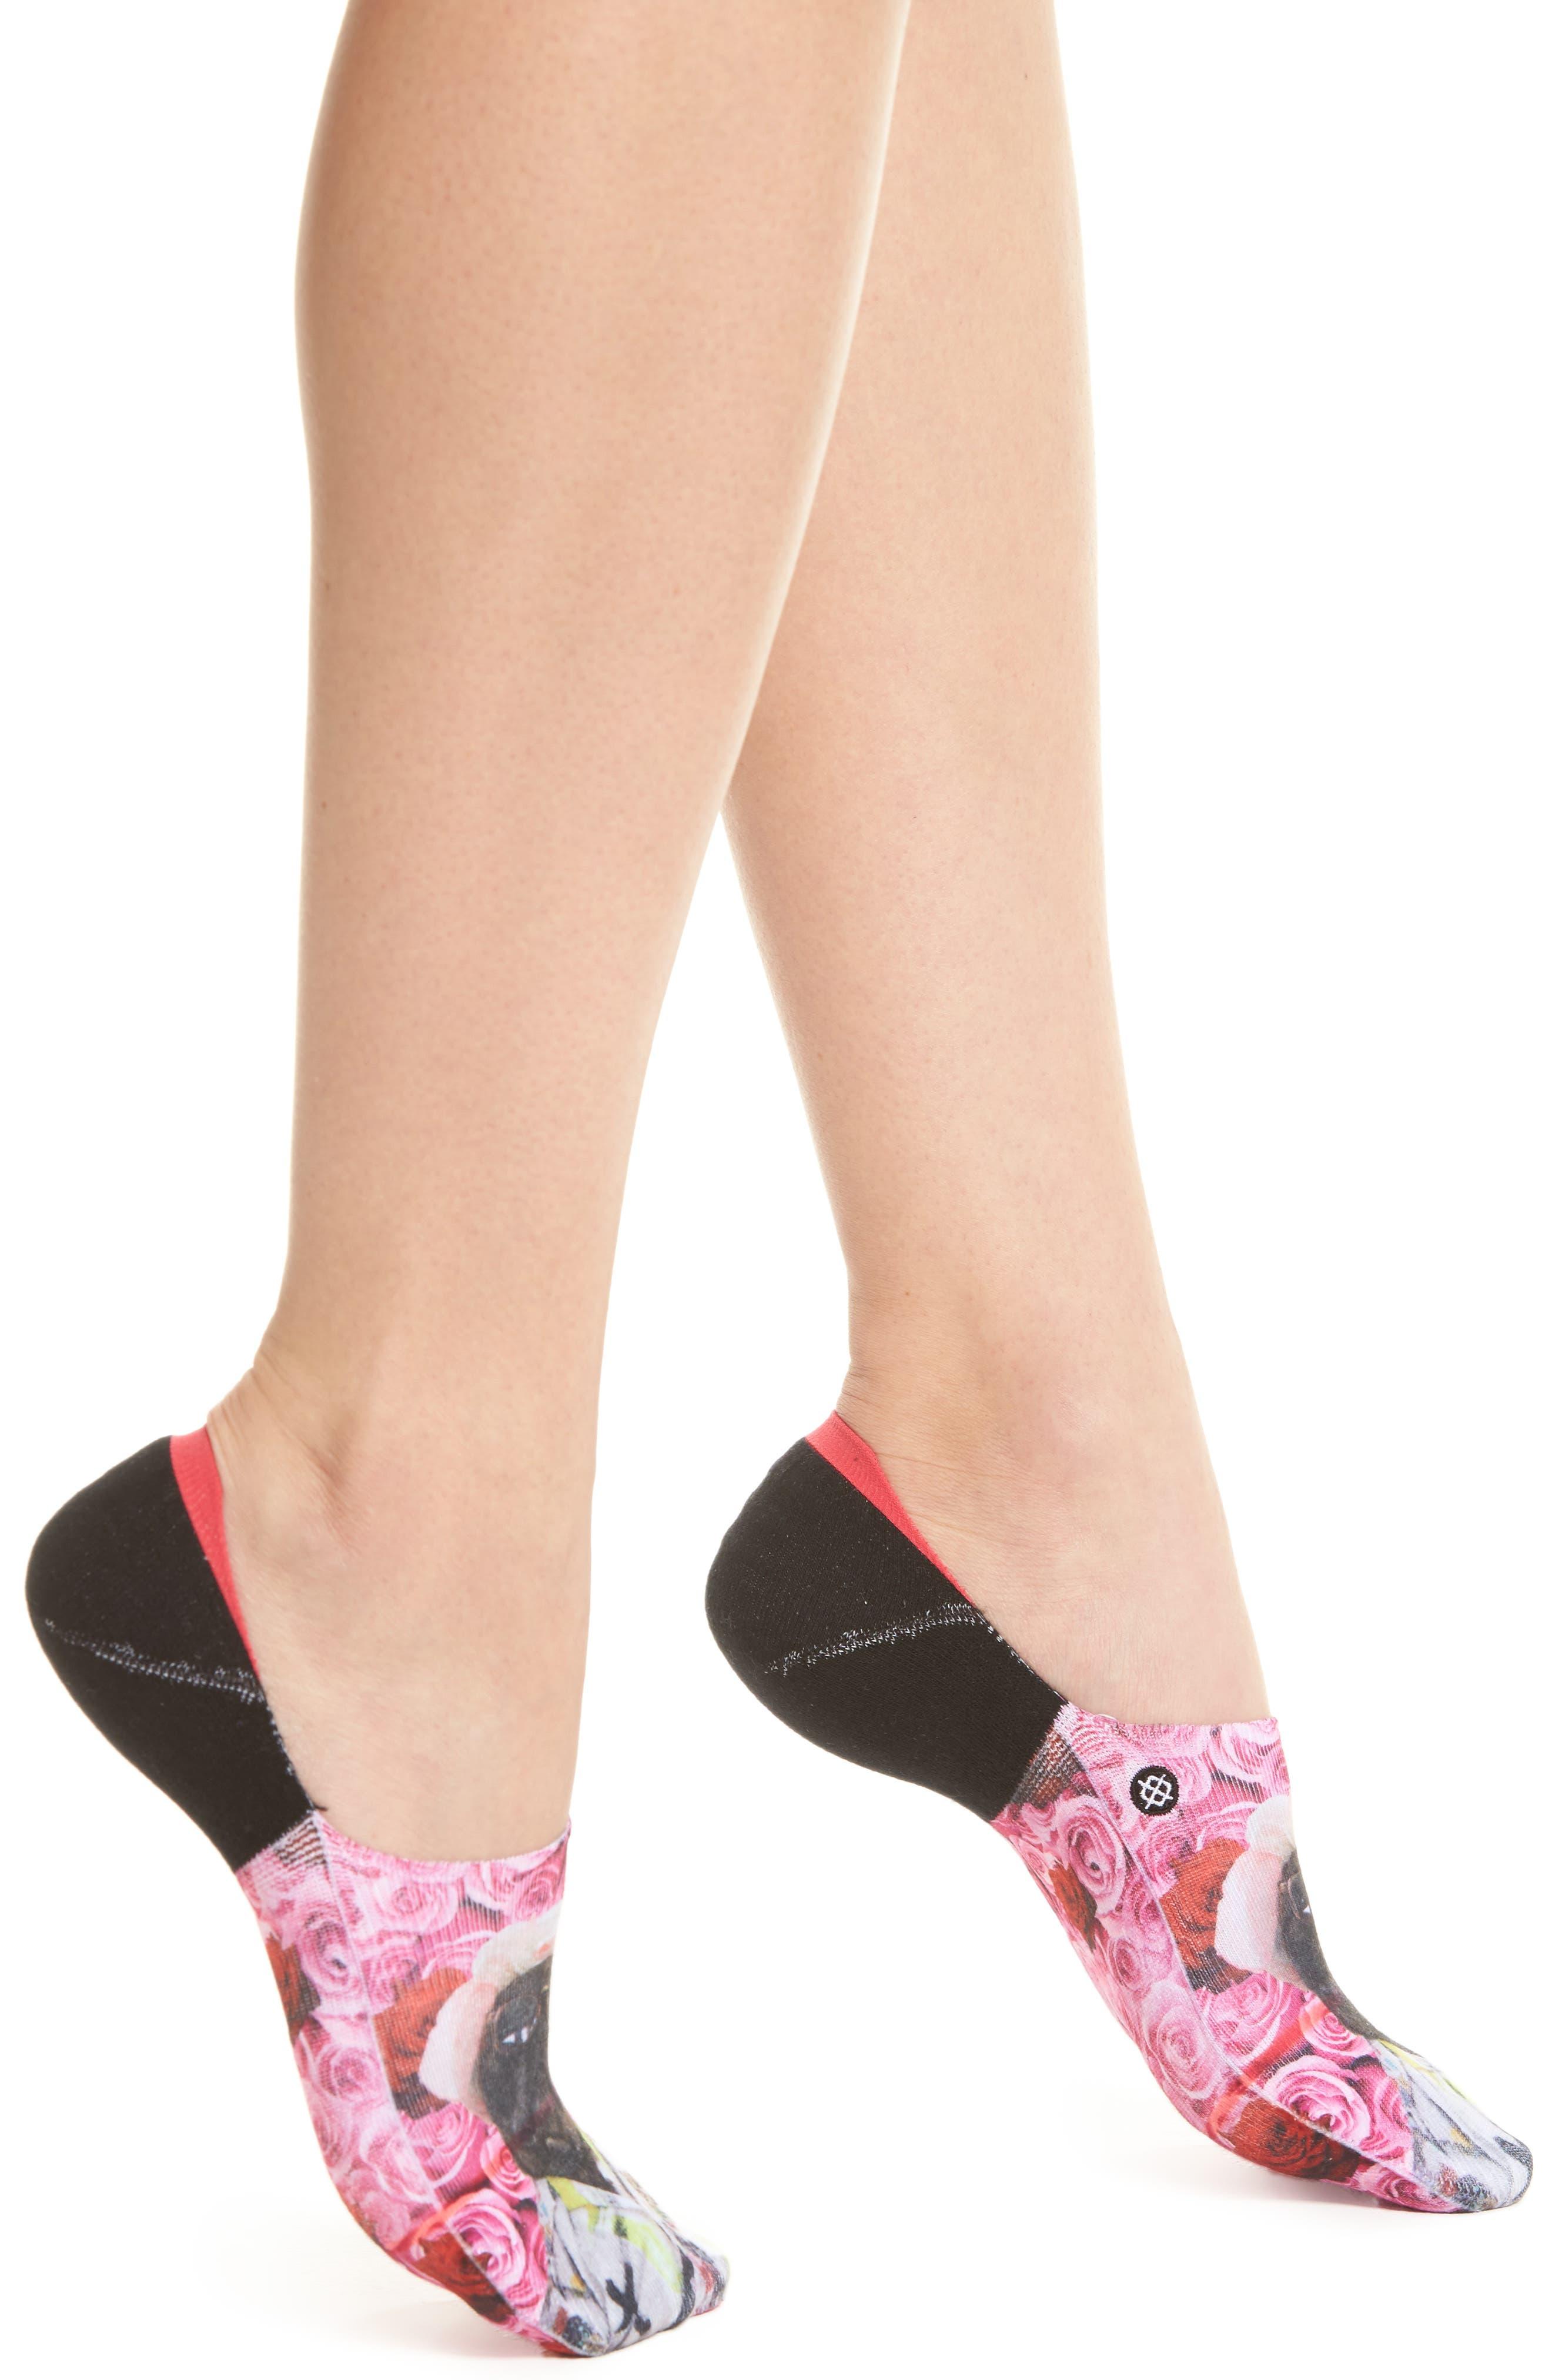 Call Me Later No-Show Socks,                         Main,                         color, Black